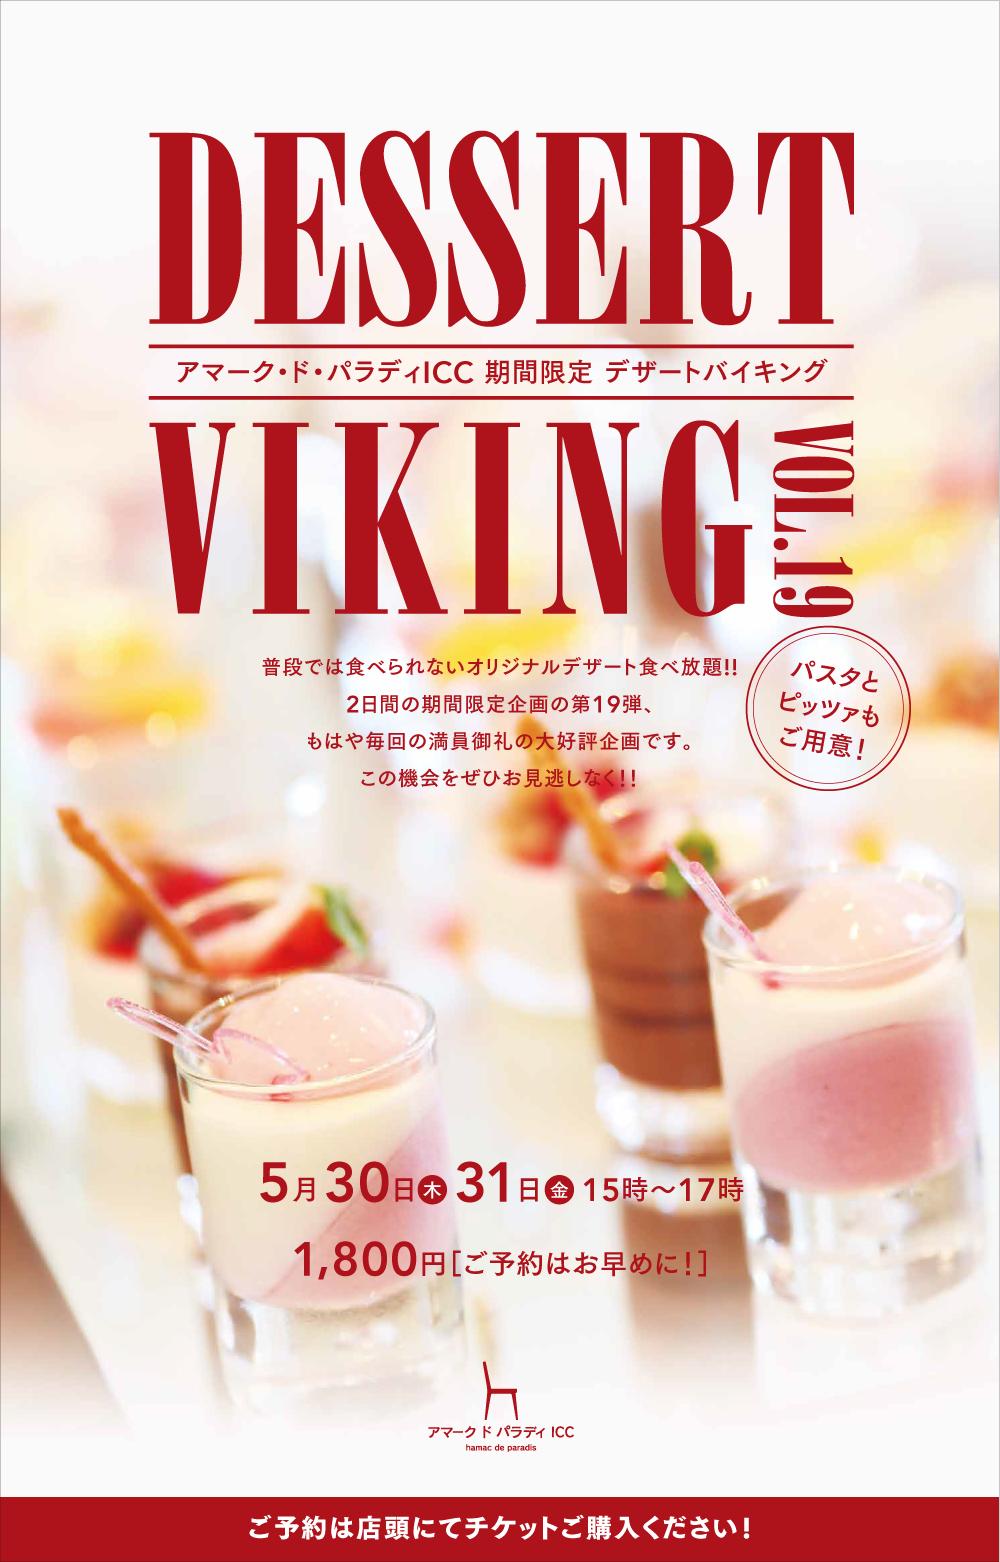 icc_flyer_dessert19.png